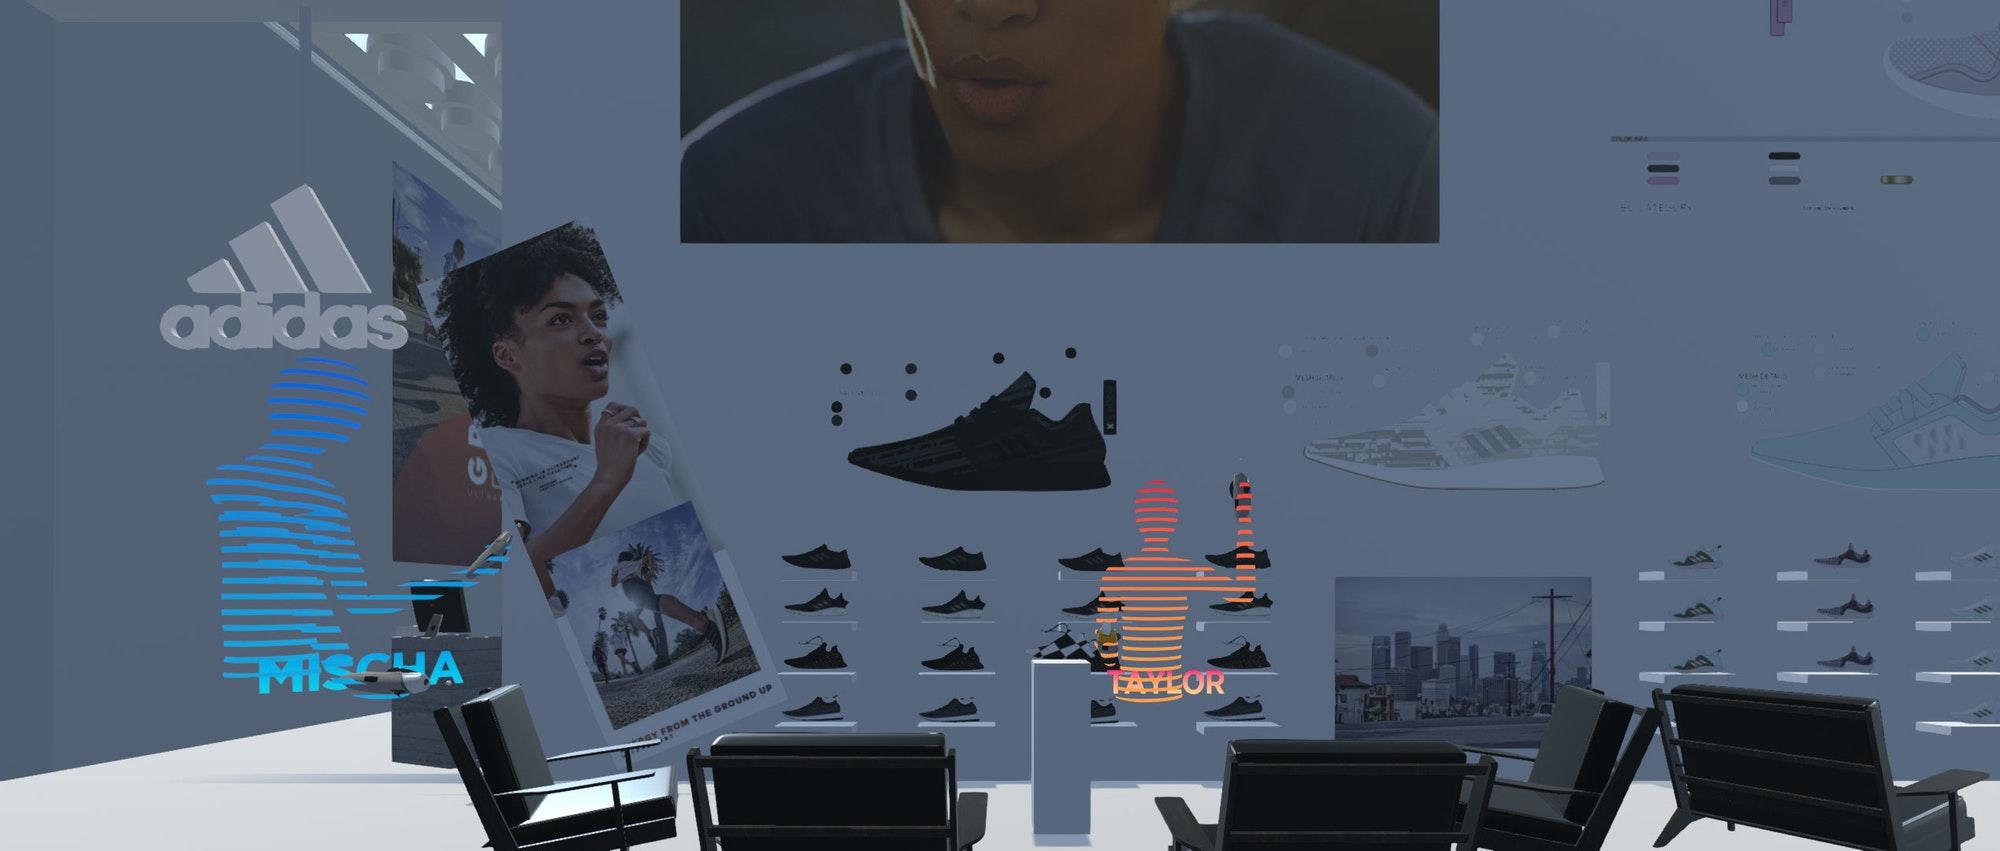 Adidas case study 3